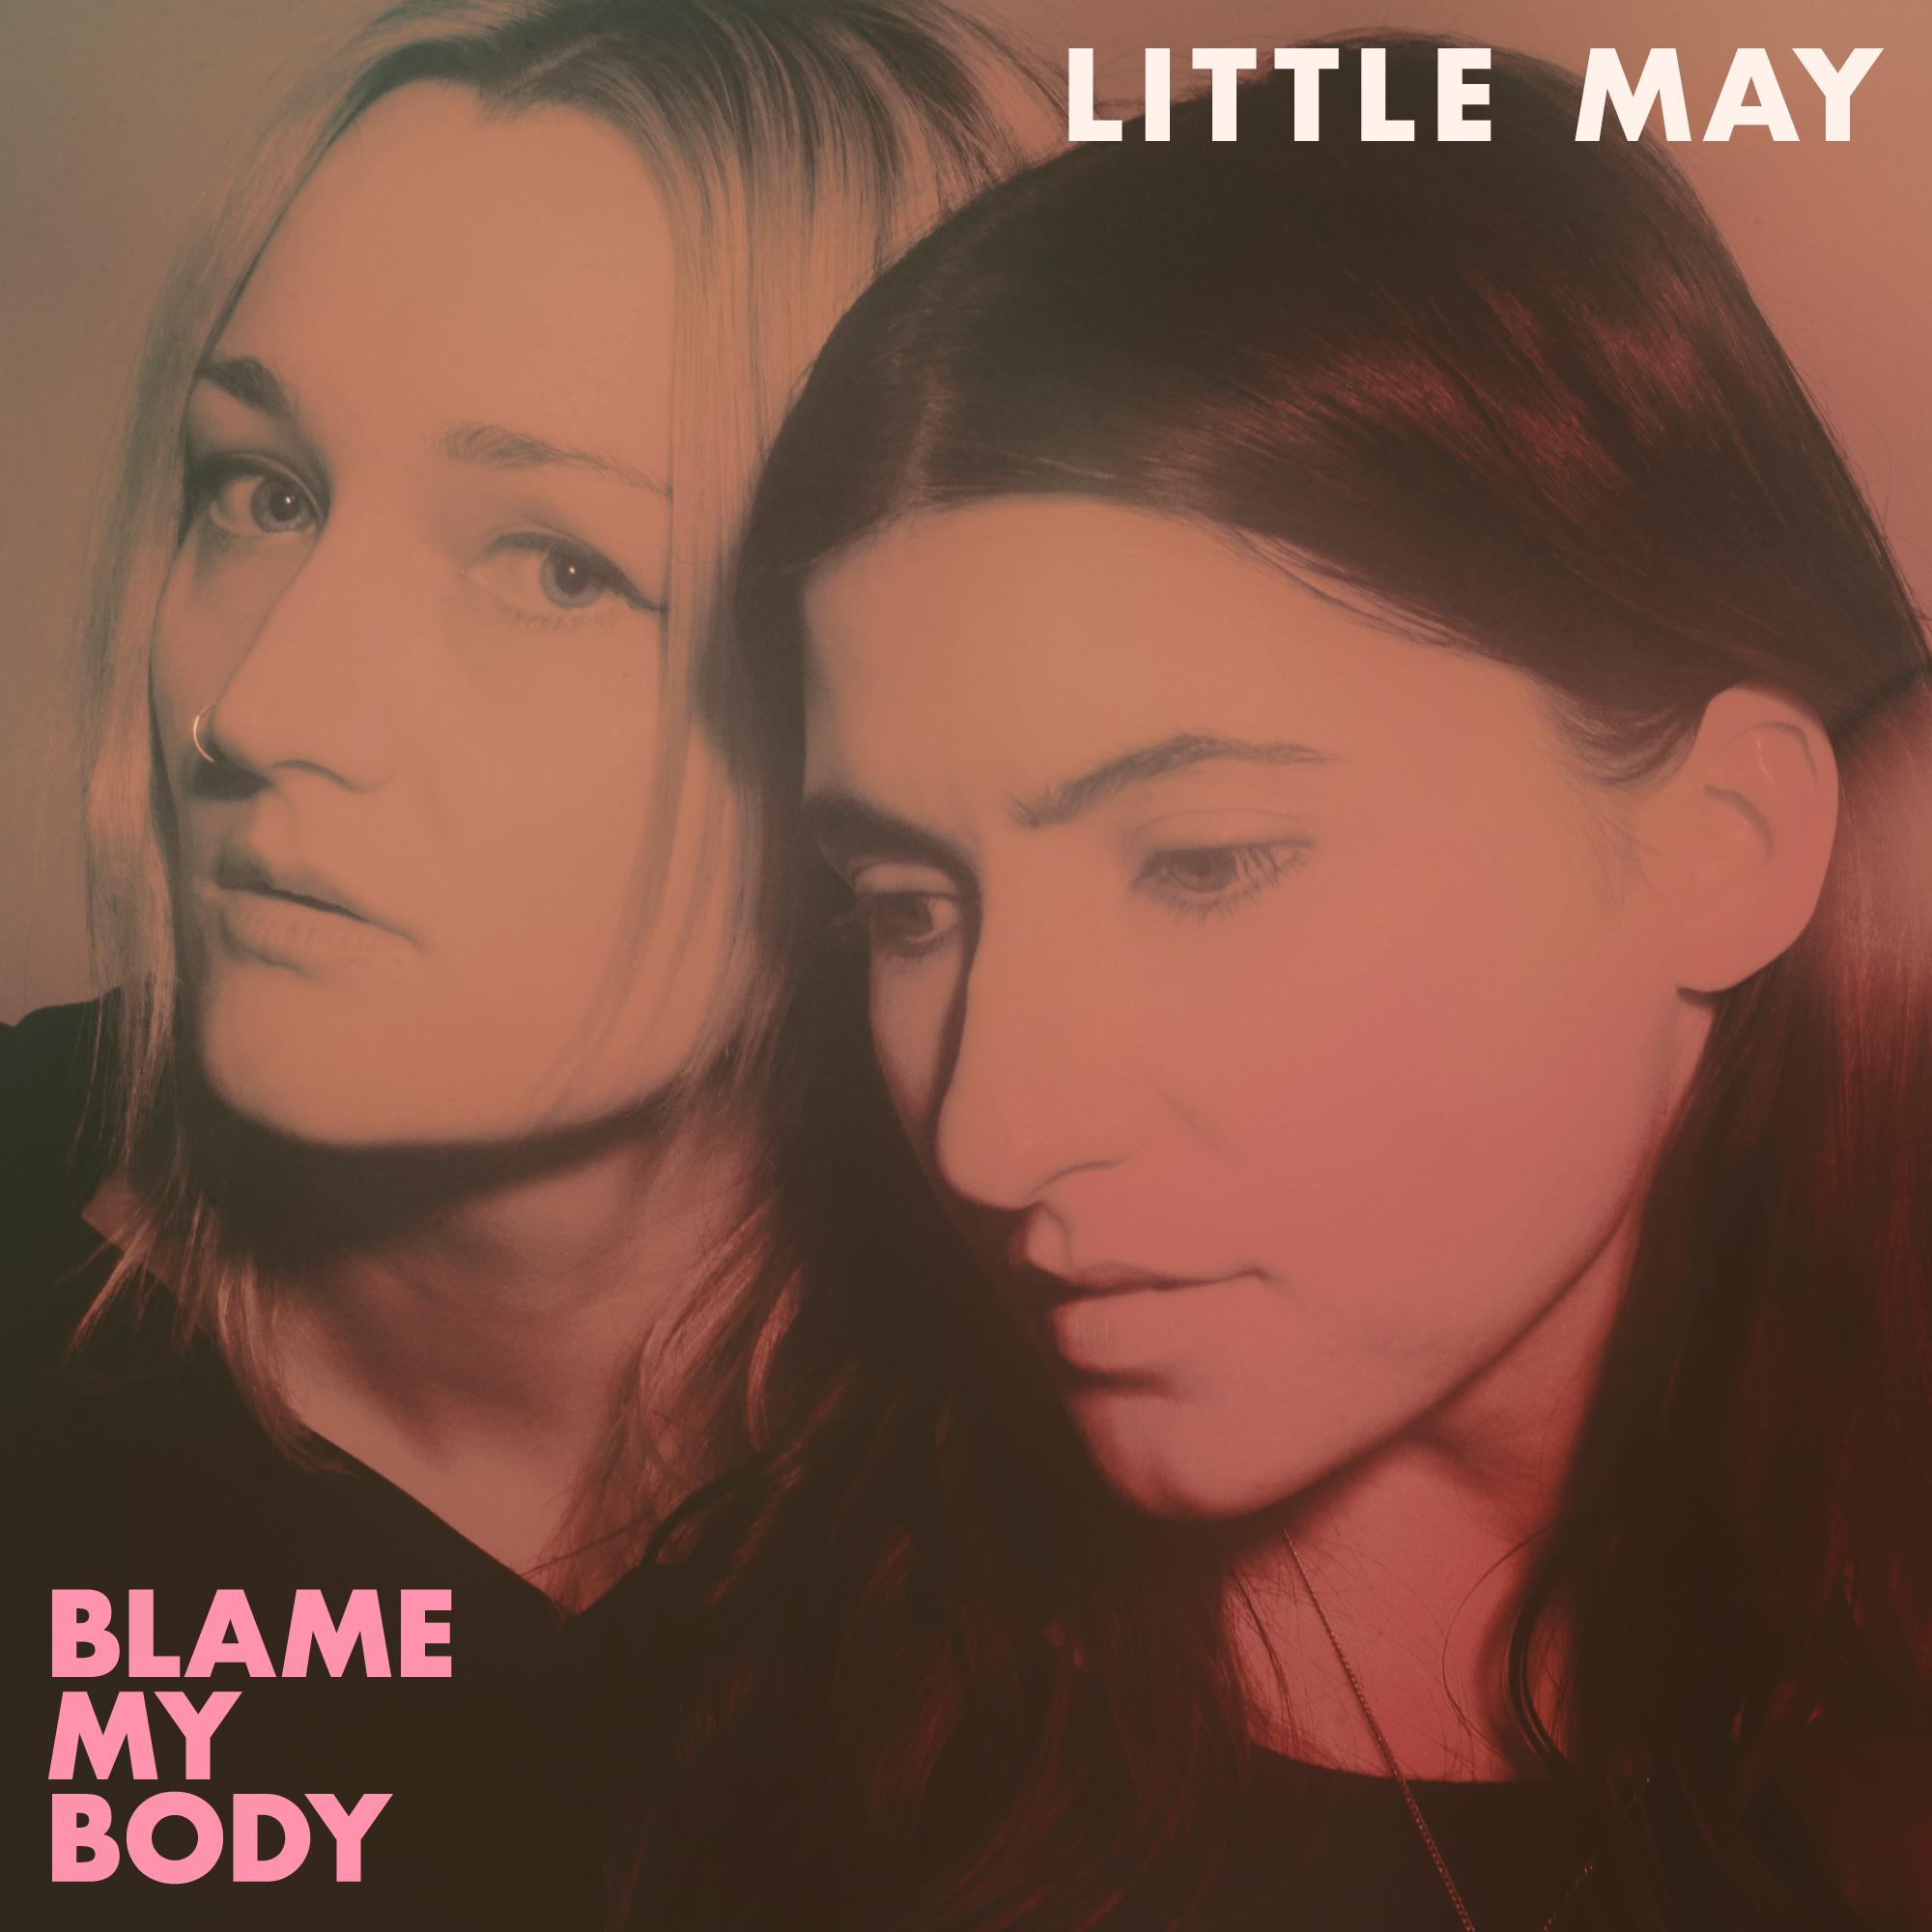 Blame My Body Album Art.jpg